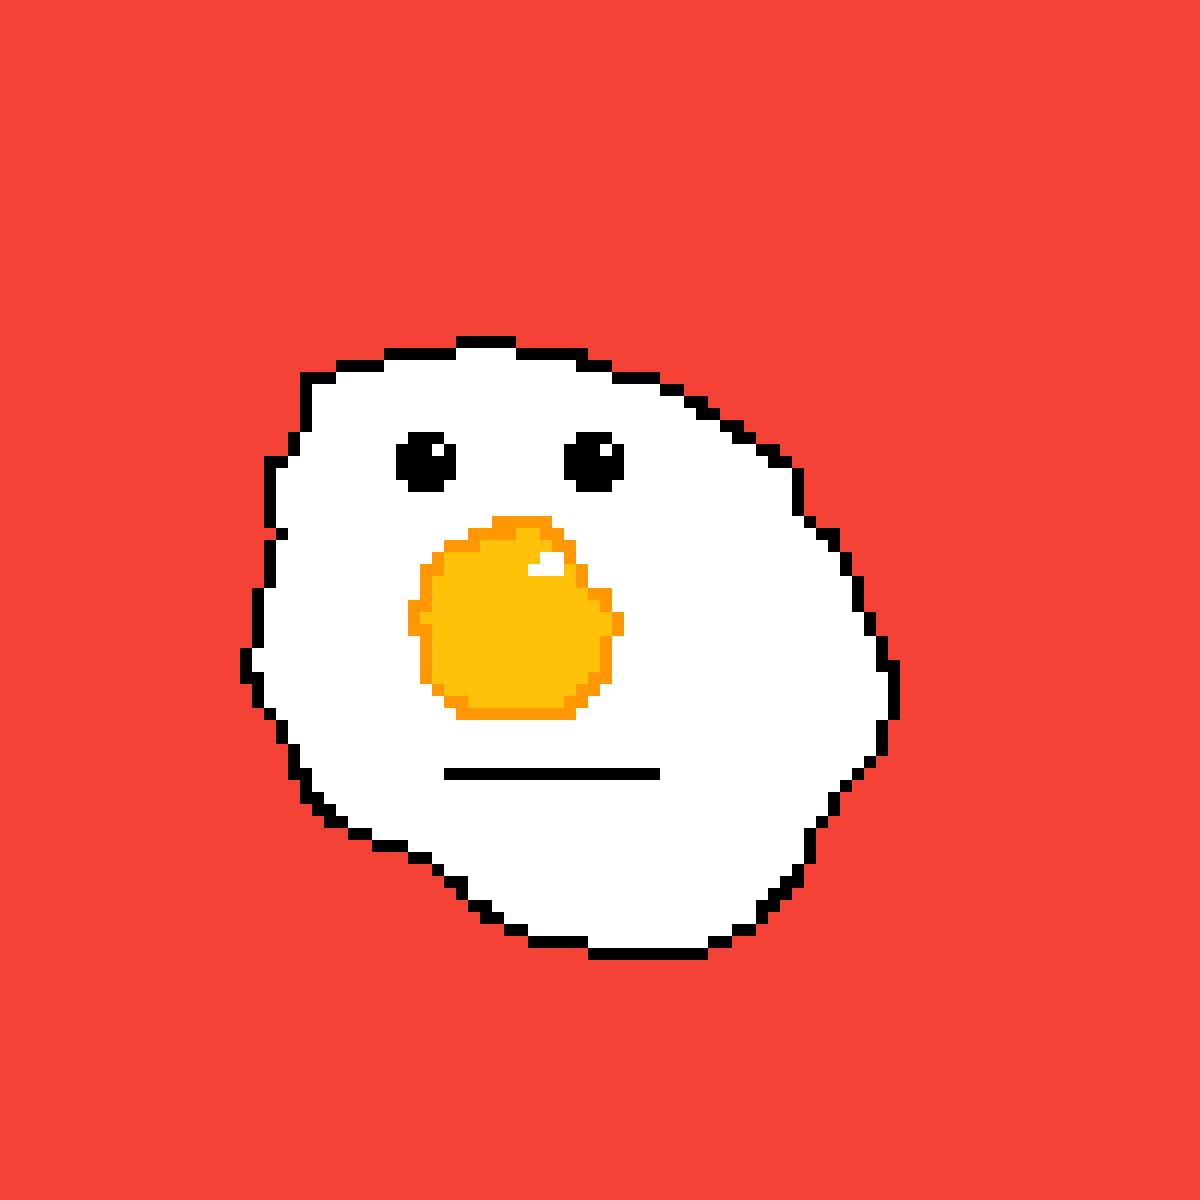 Bob the egg